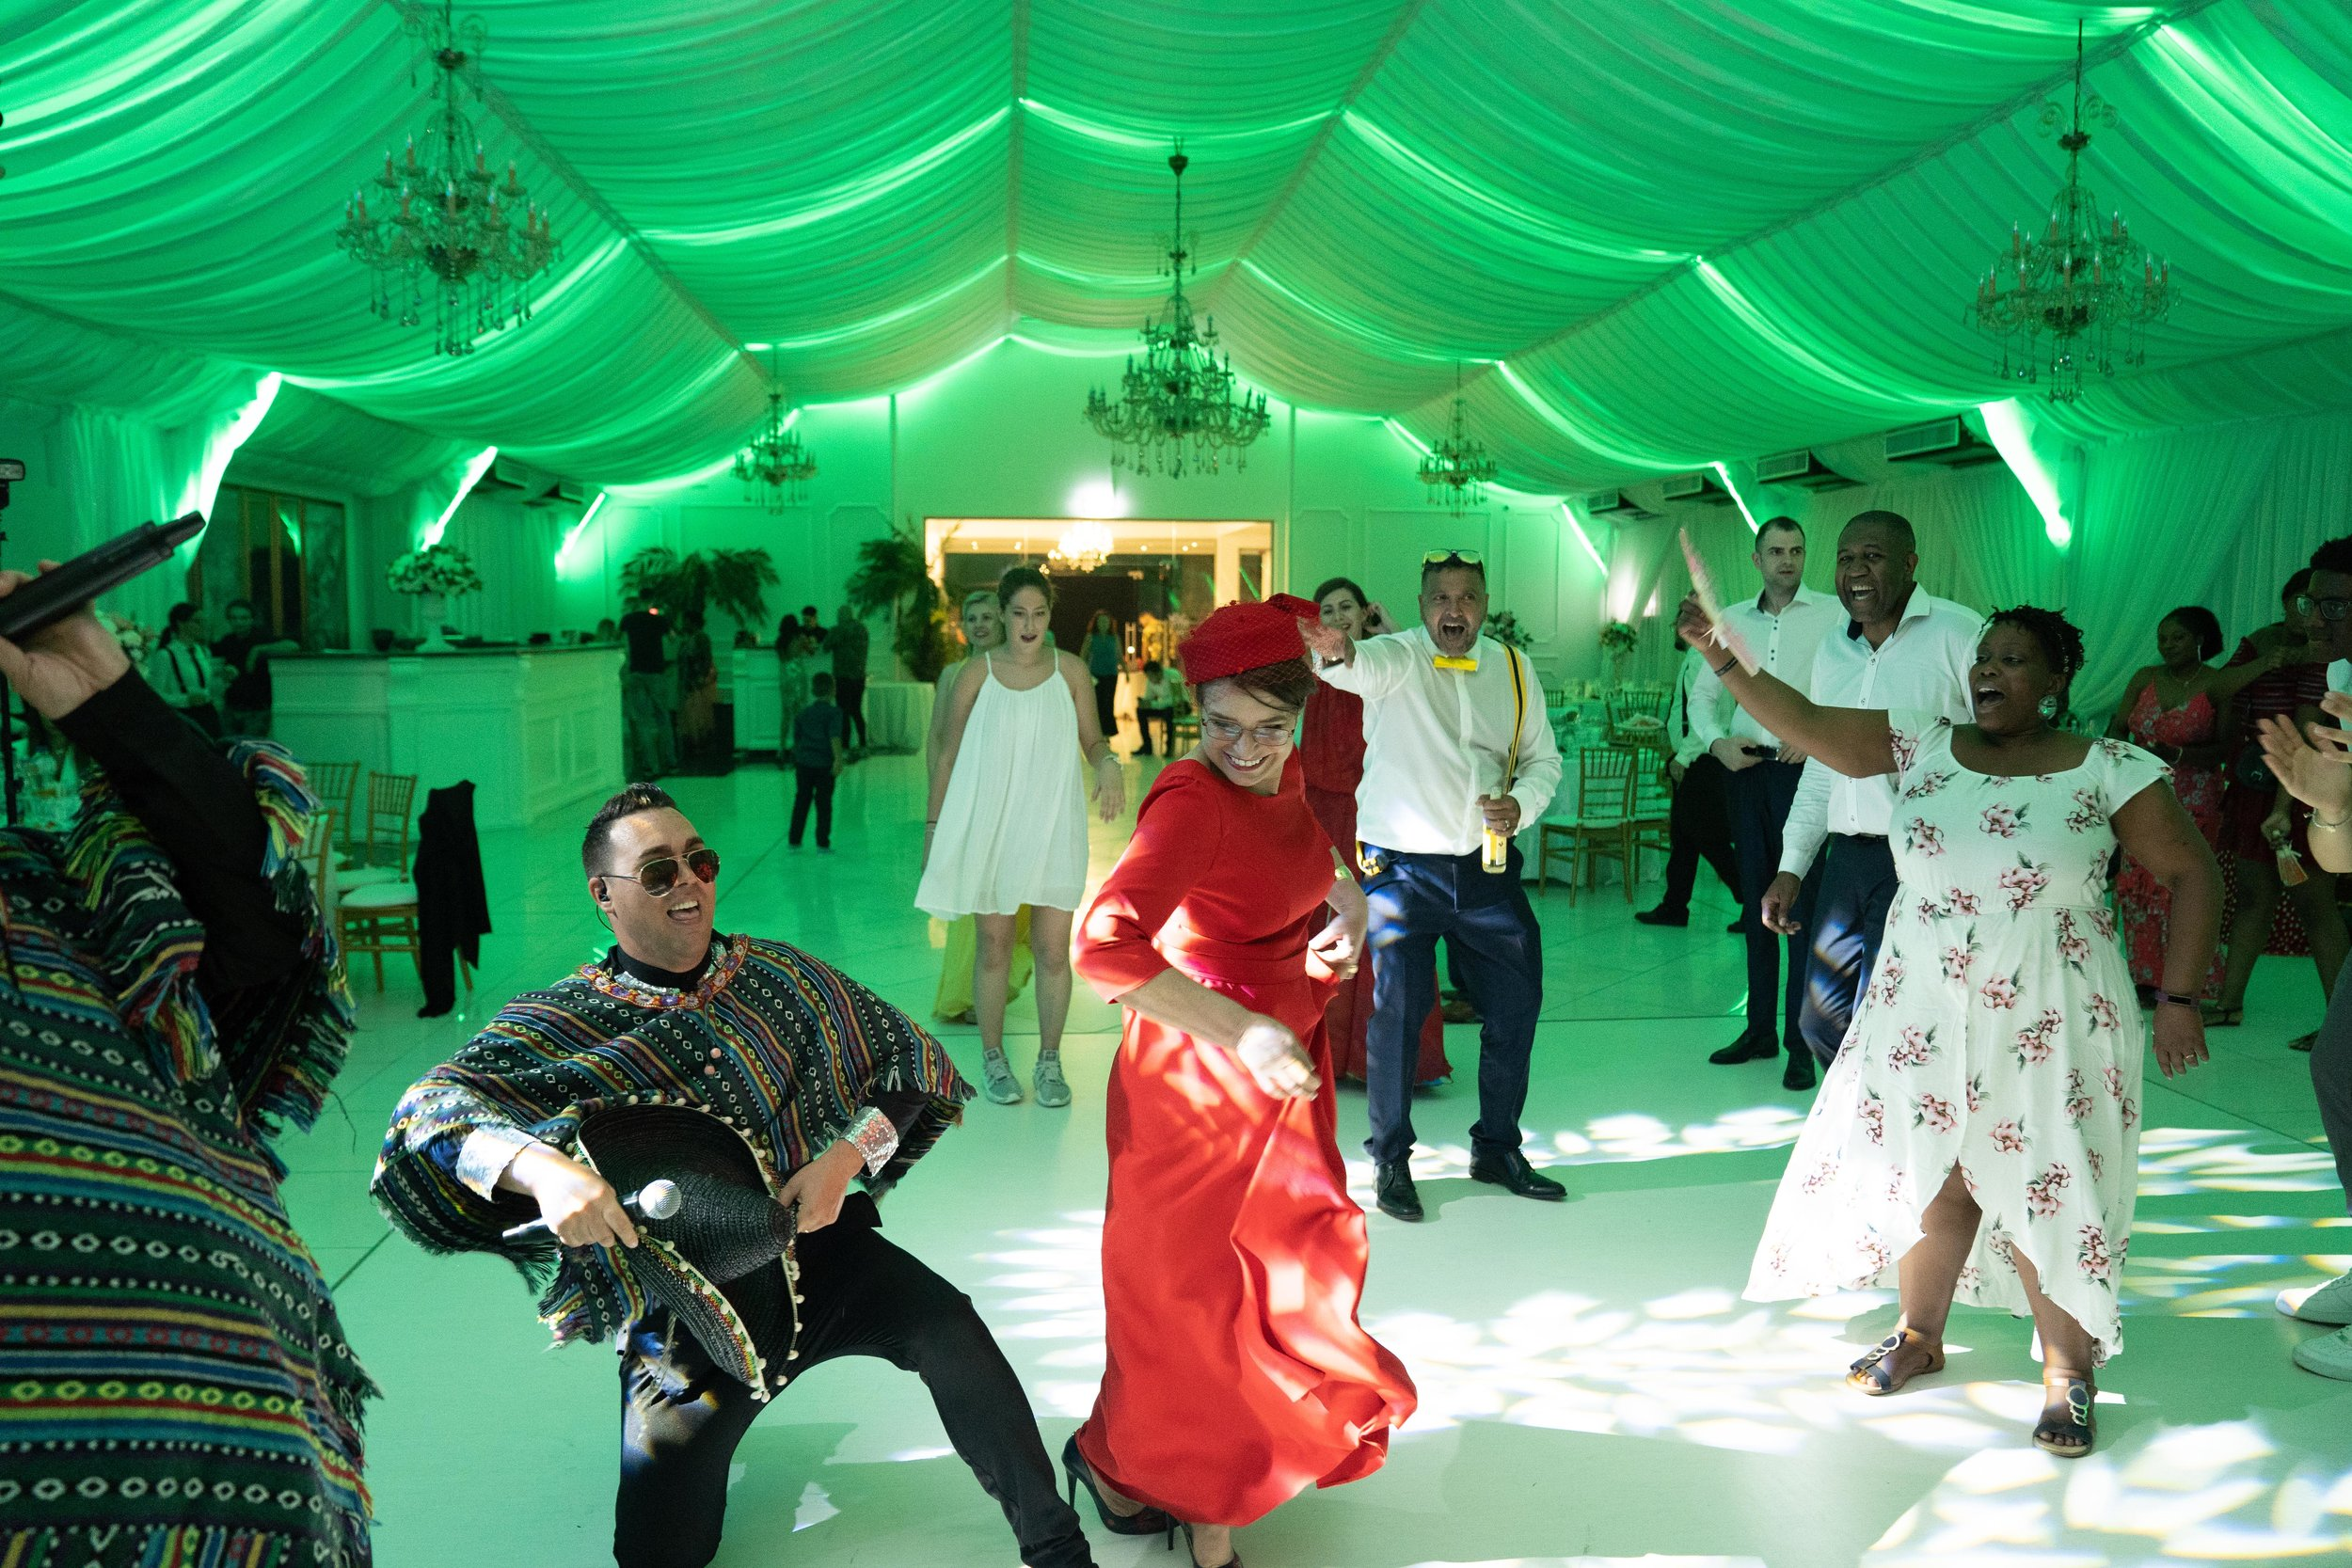 london-romania-destination-wedding-photographer-videographer-130